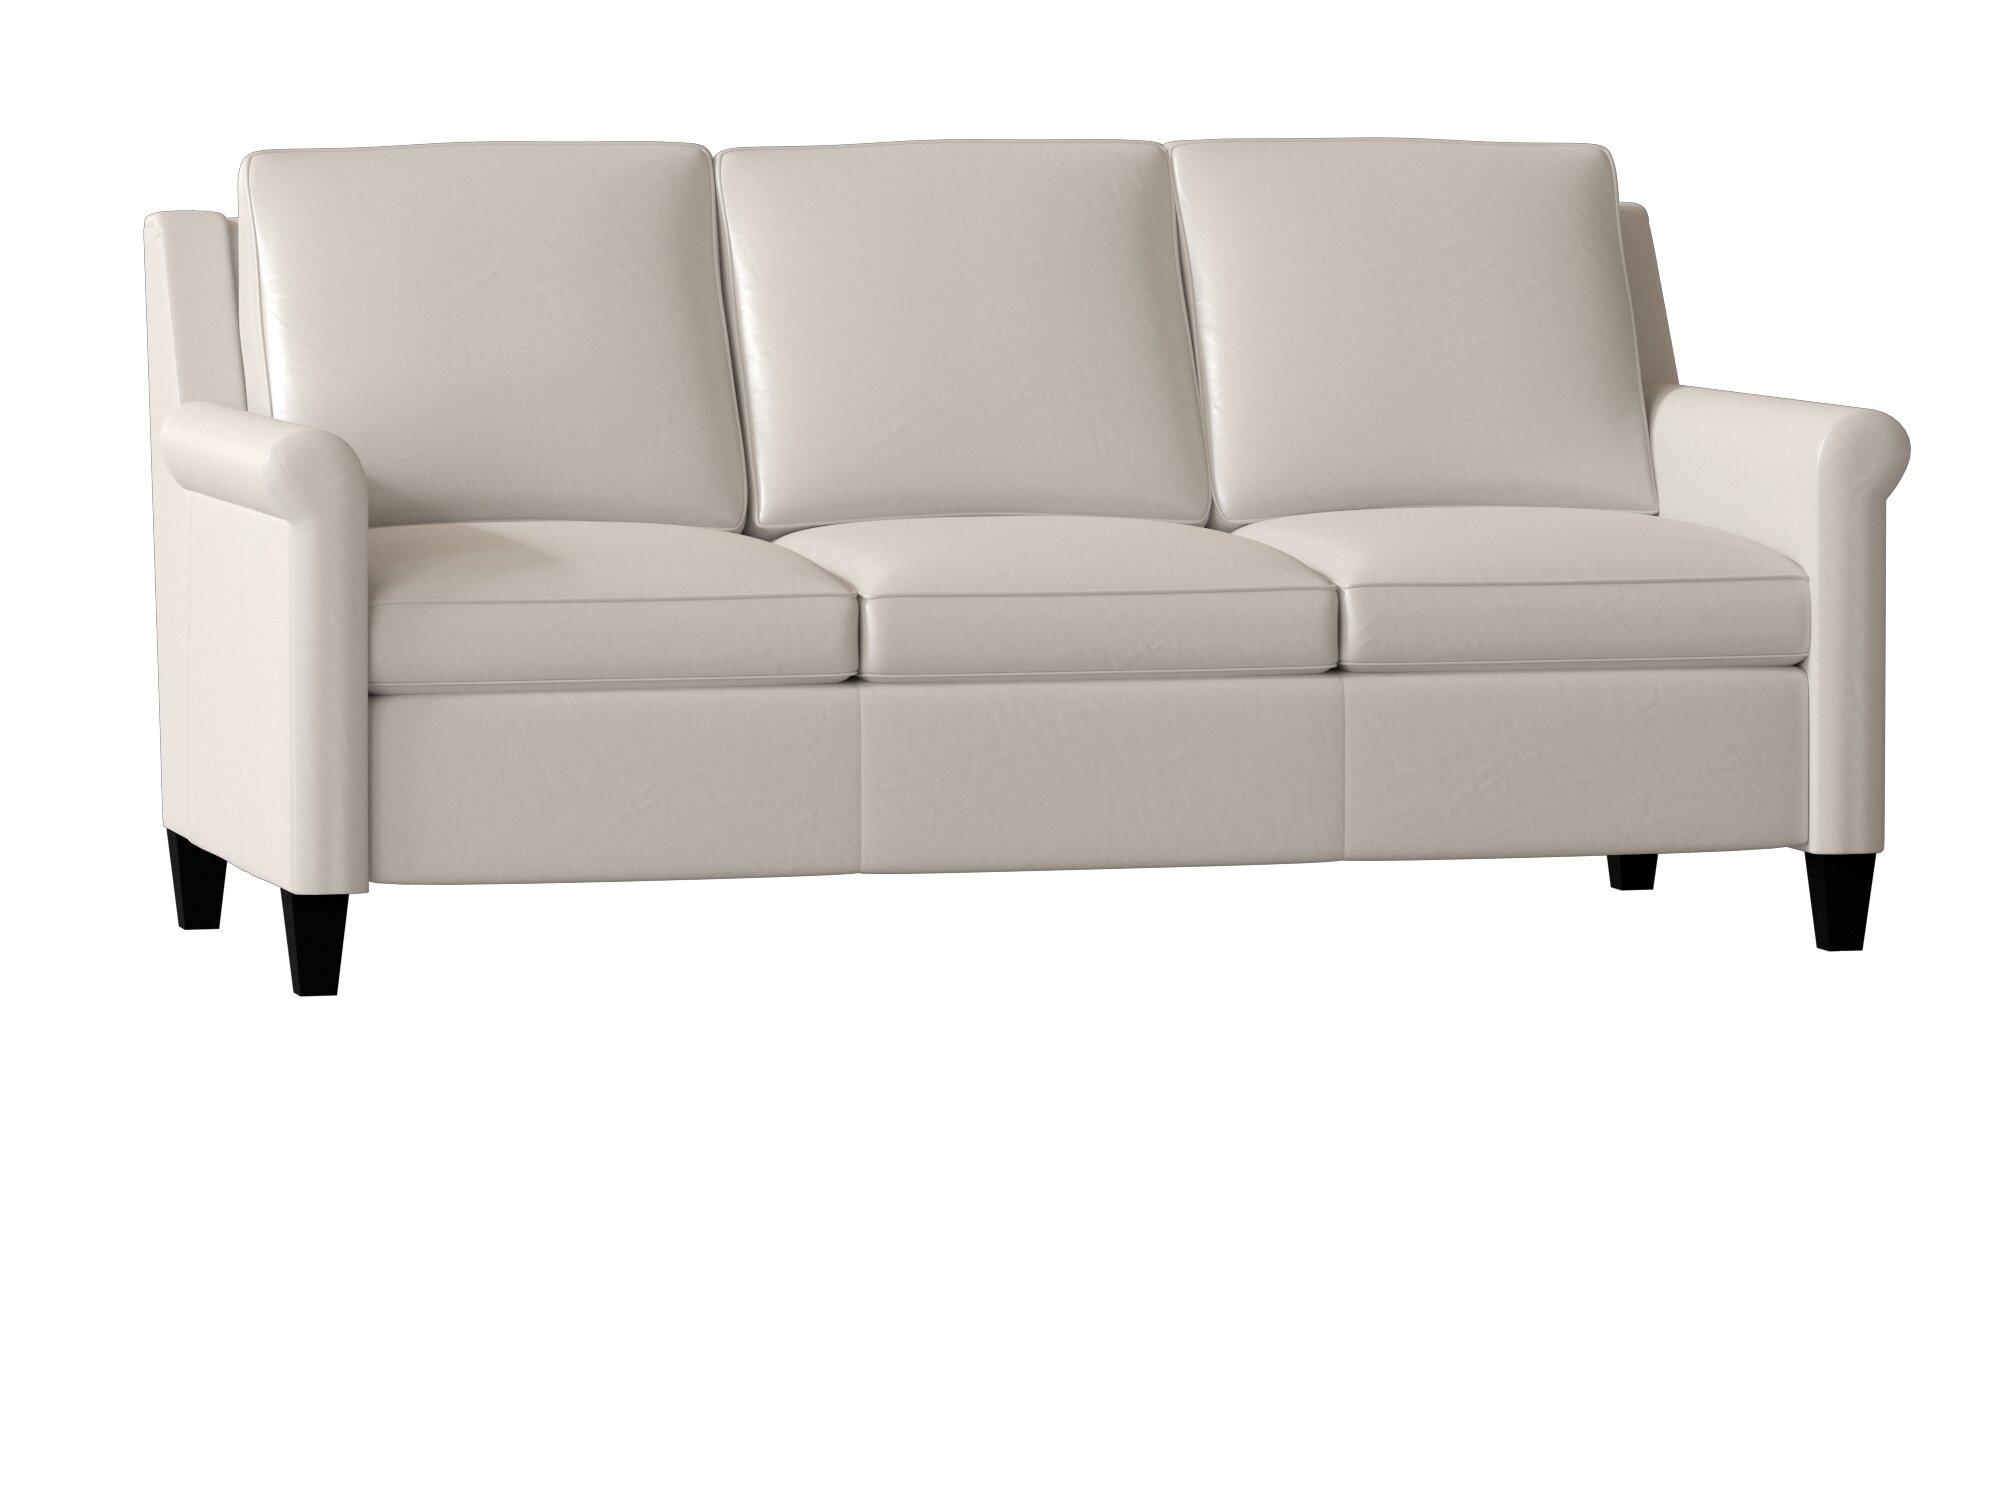 Bradington Young Timber Leather Sofa